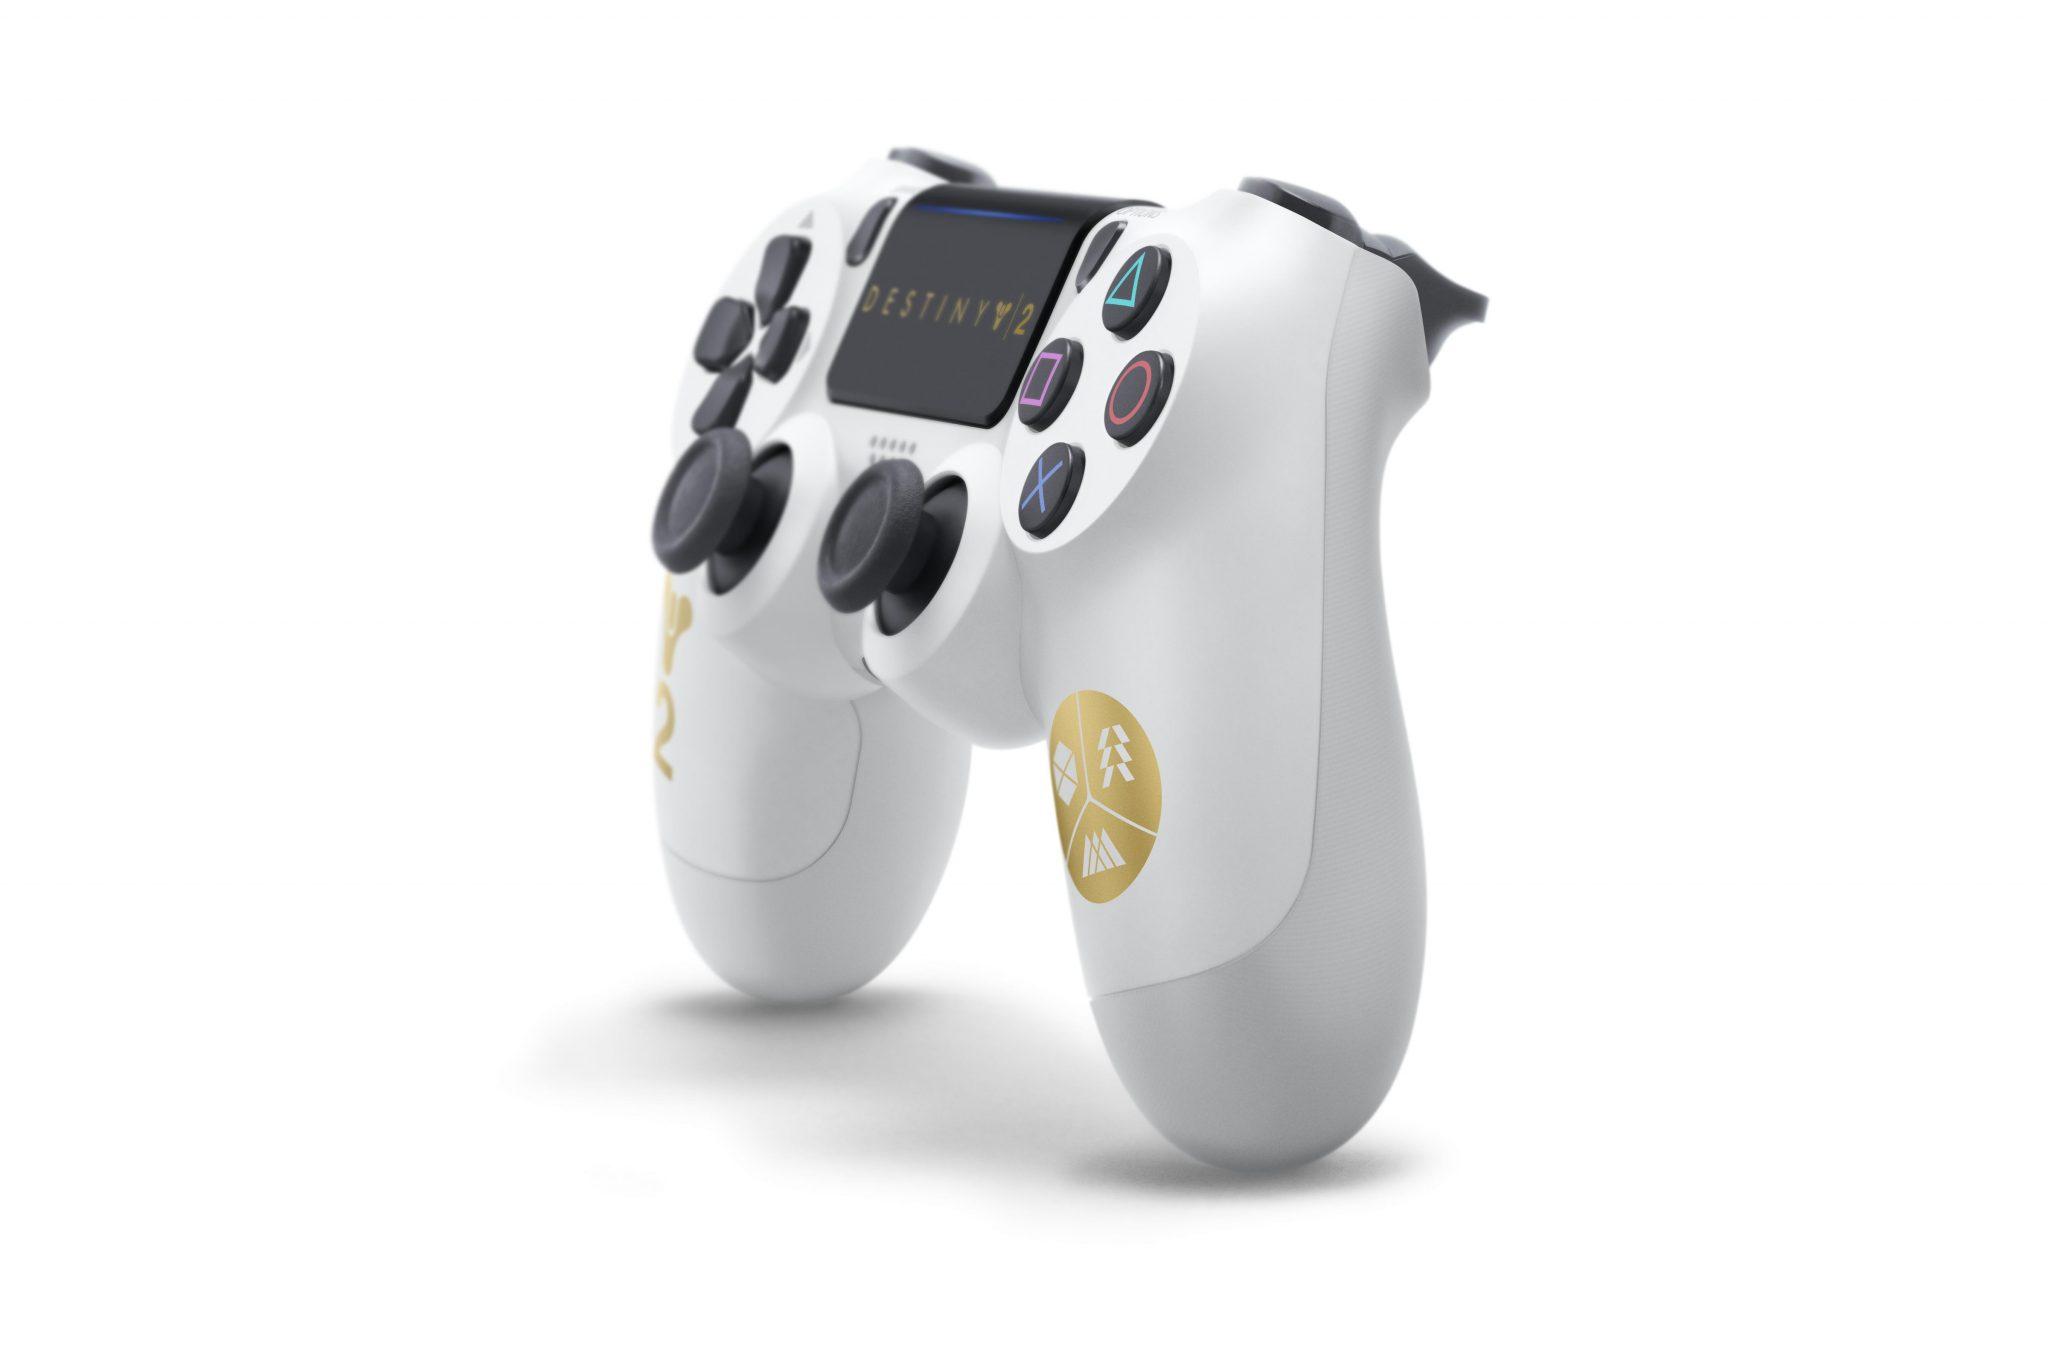 Destiny-2-DualShock-3-GamersRD